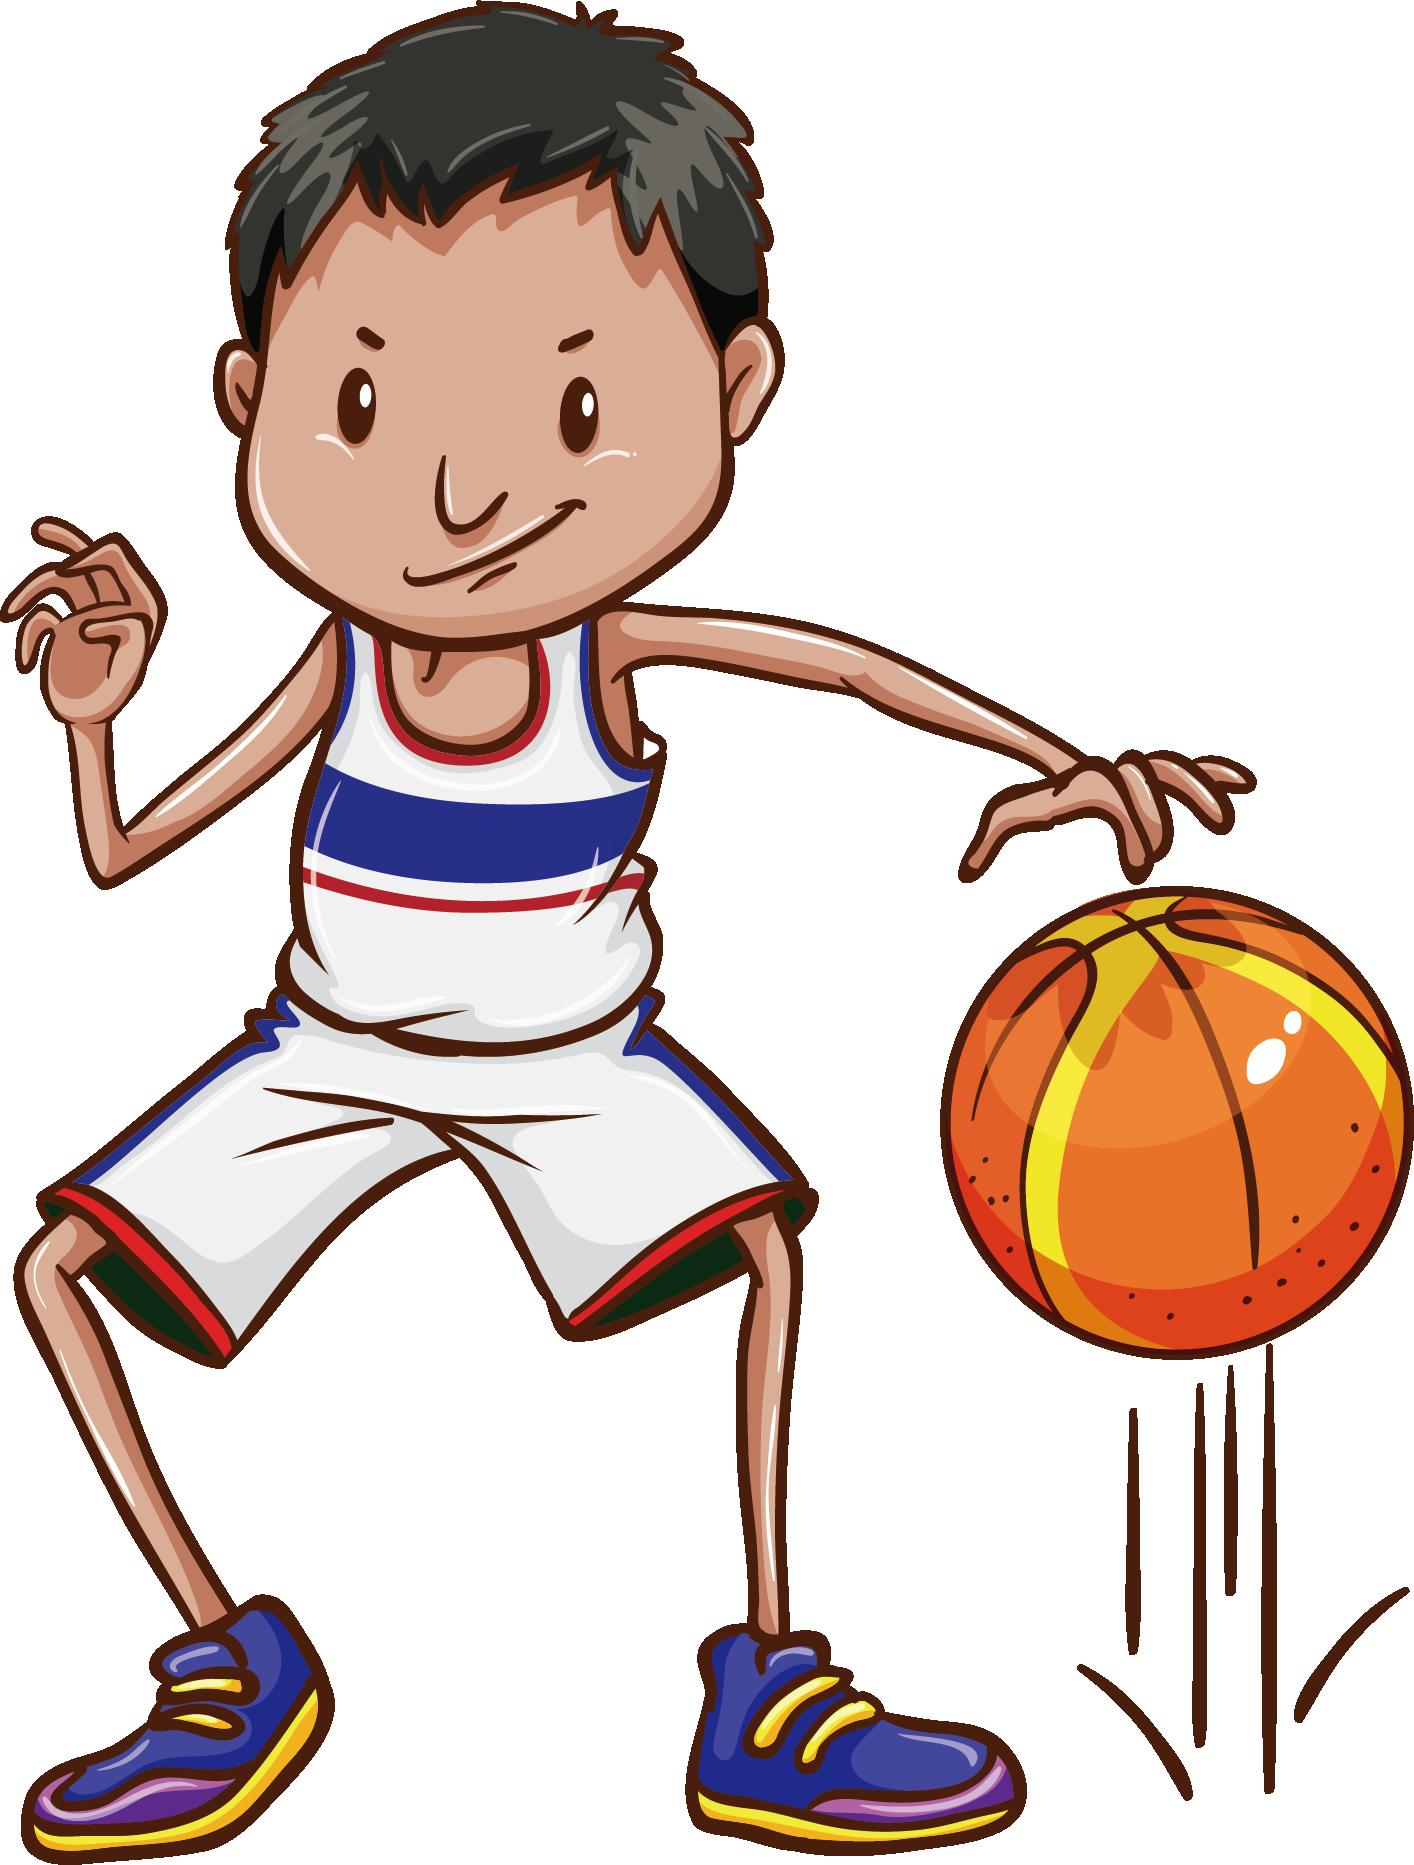 Basketball boy clipart banner free library Basketball Dribbling Clip art - Physical education basketball 1414 ... banner free library